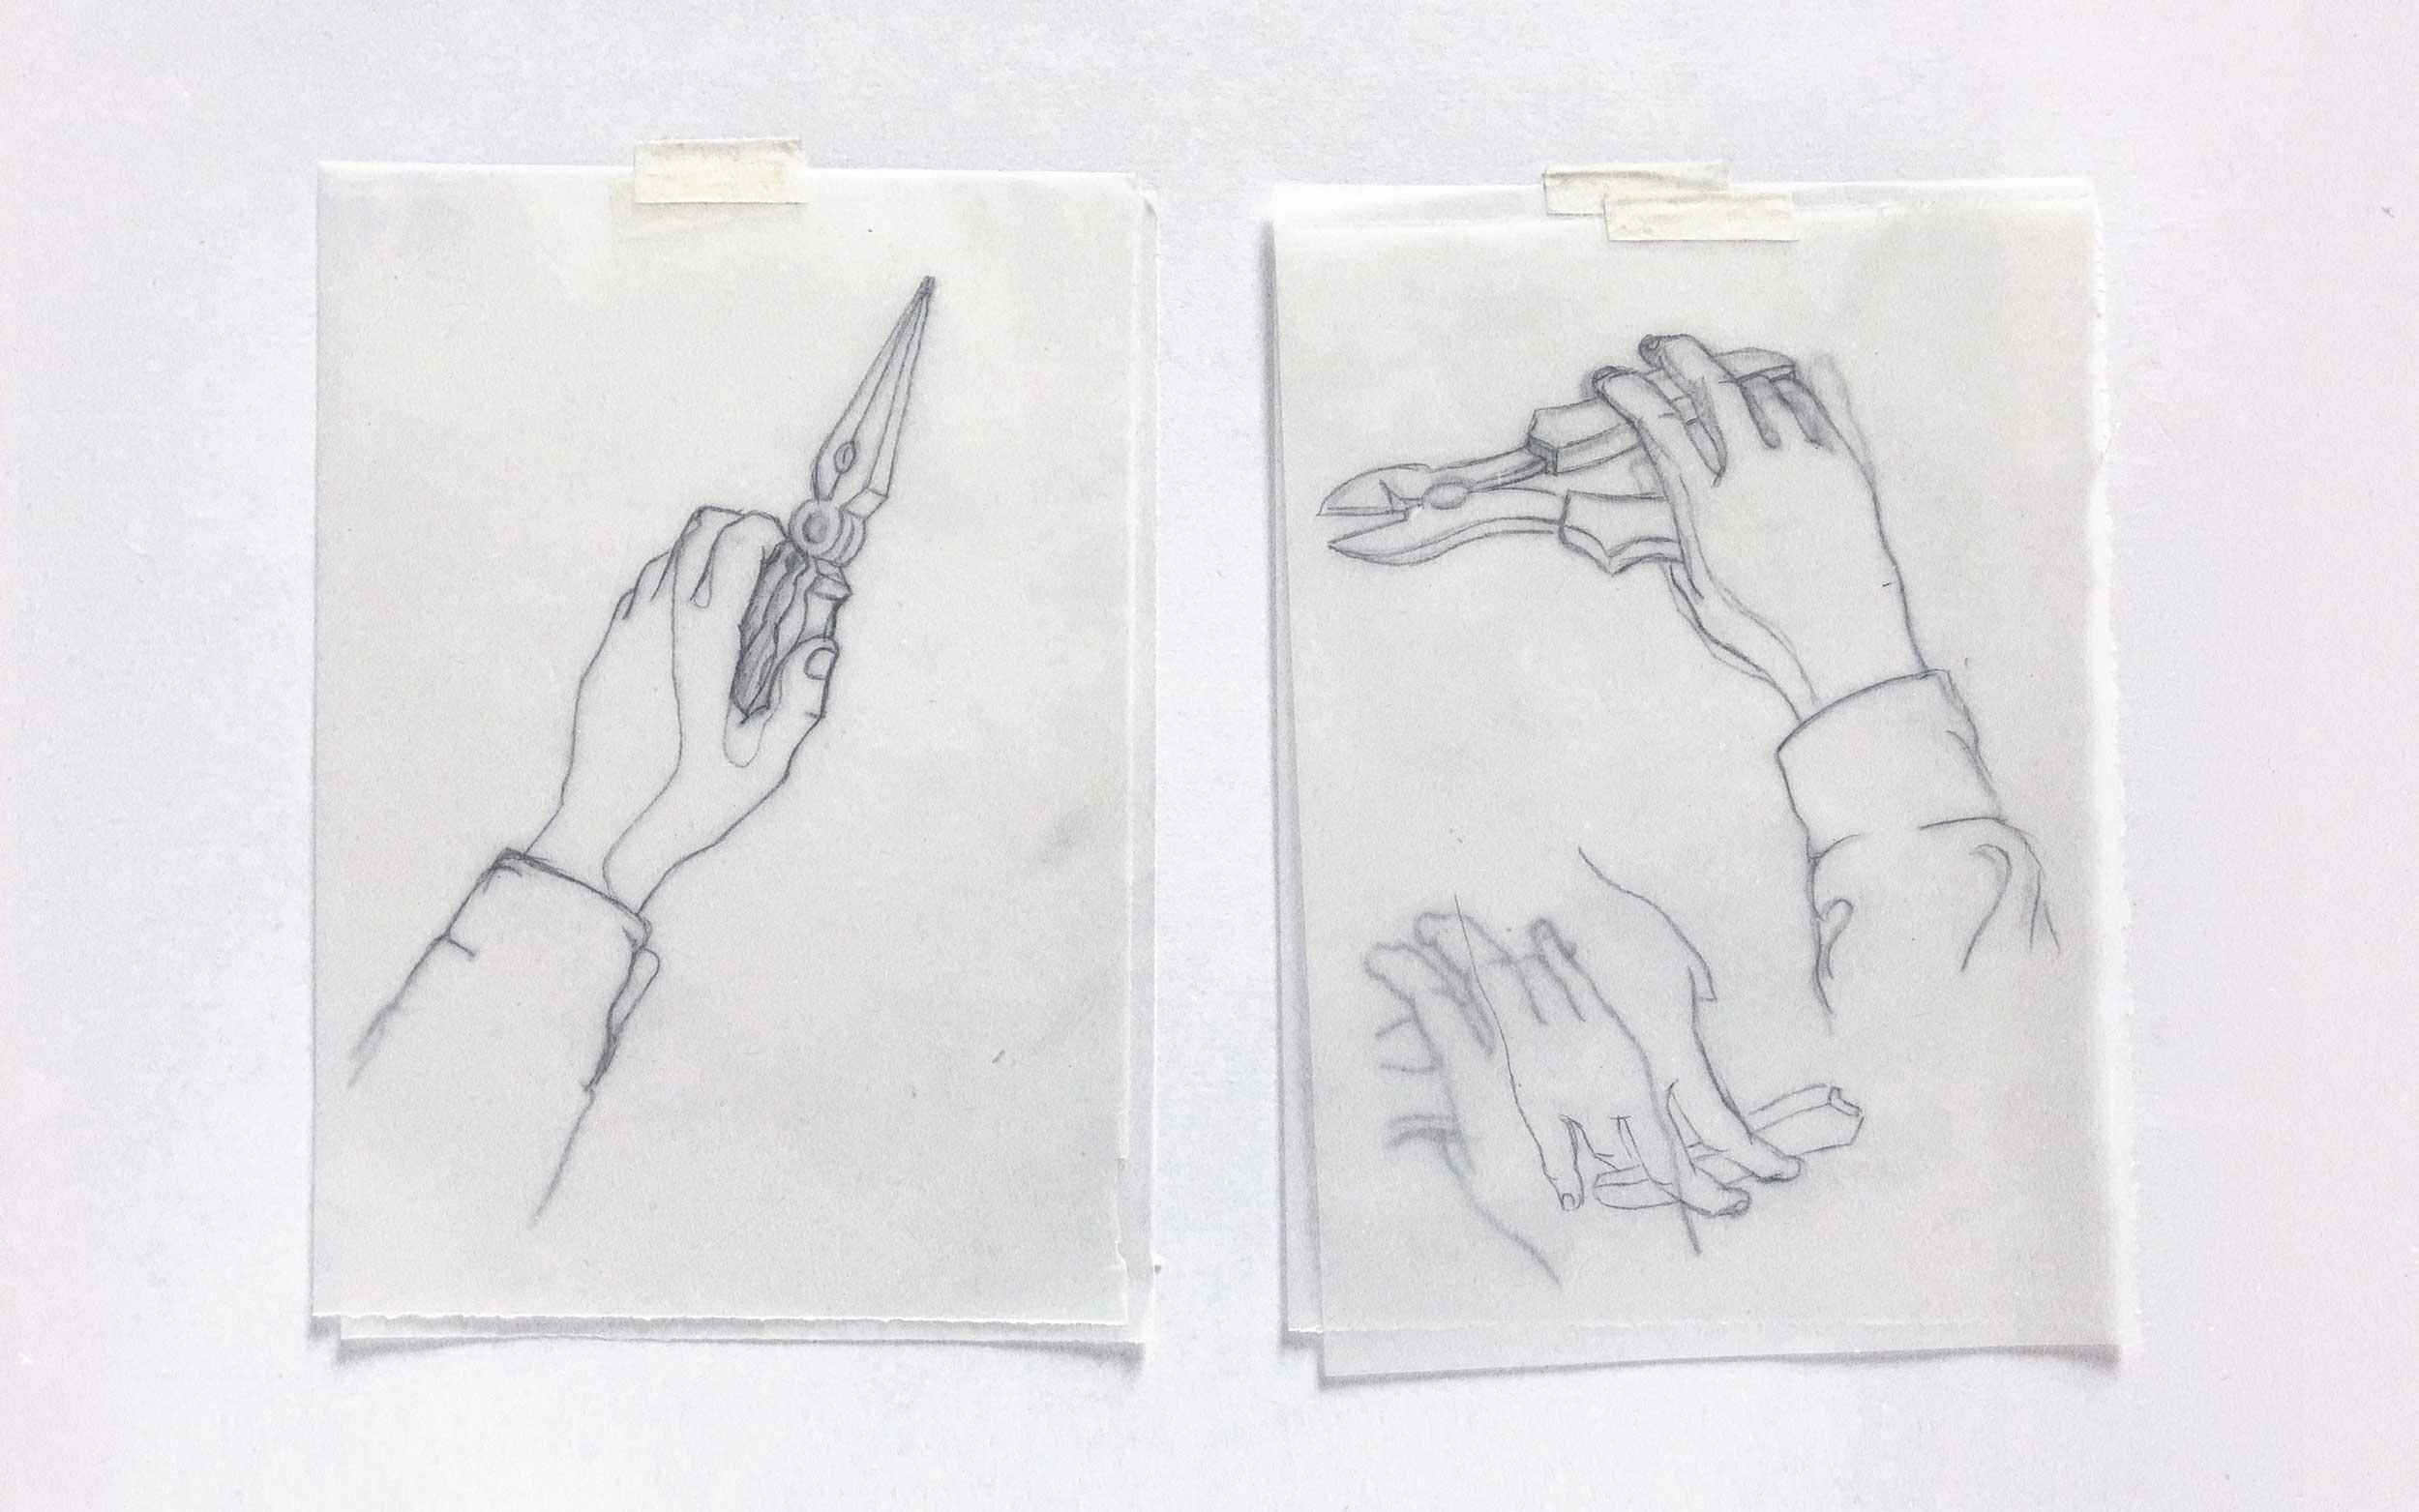 NatureHackers-Sketch-2500px.jpg